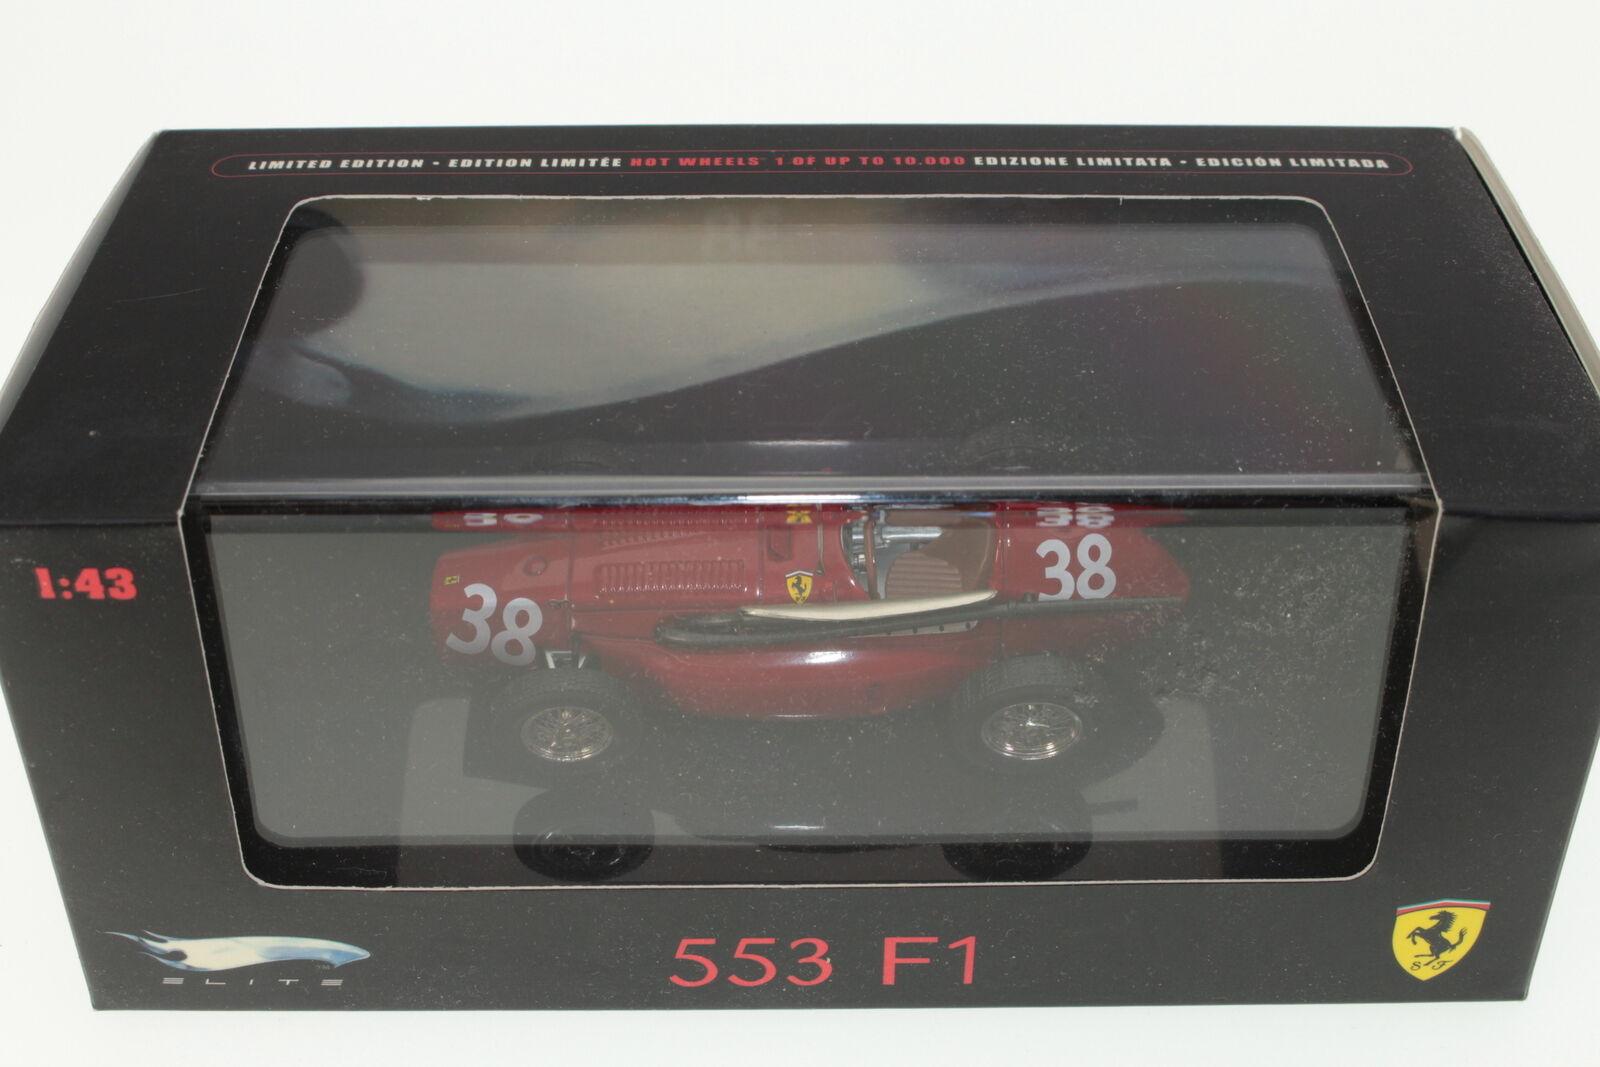 Mattel  N5586 - Ferrari 553 F1 - Hot Wheels - Red - A+ A